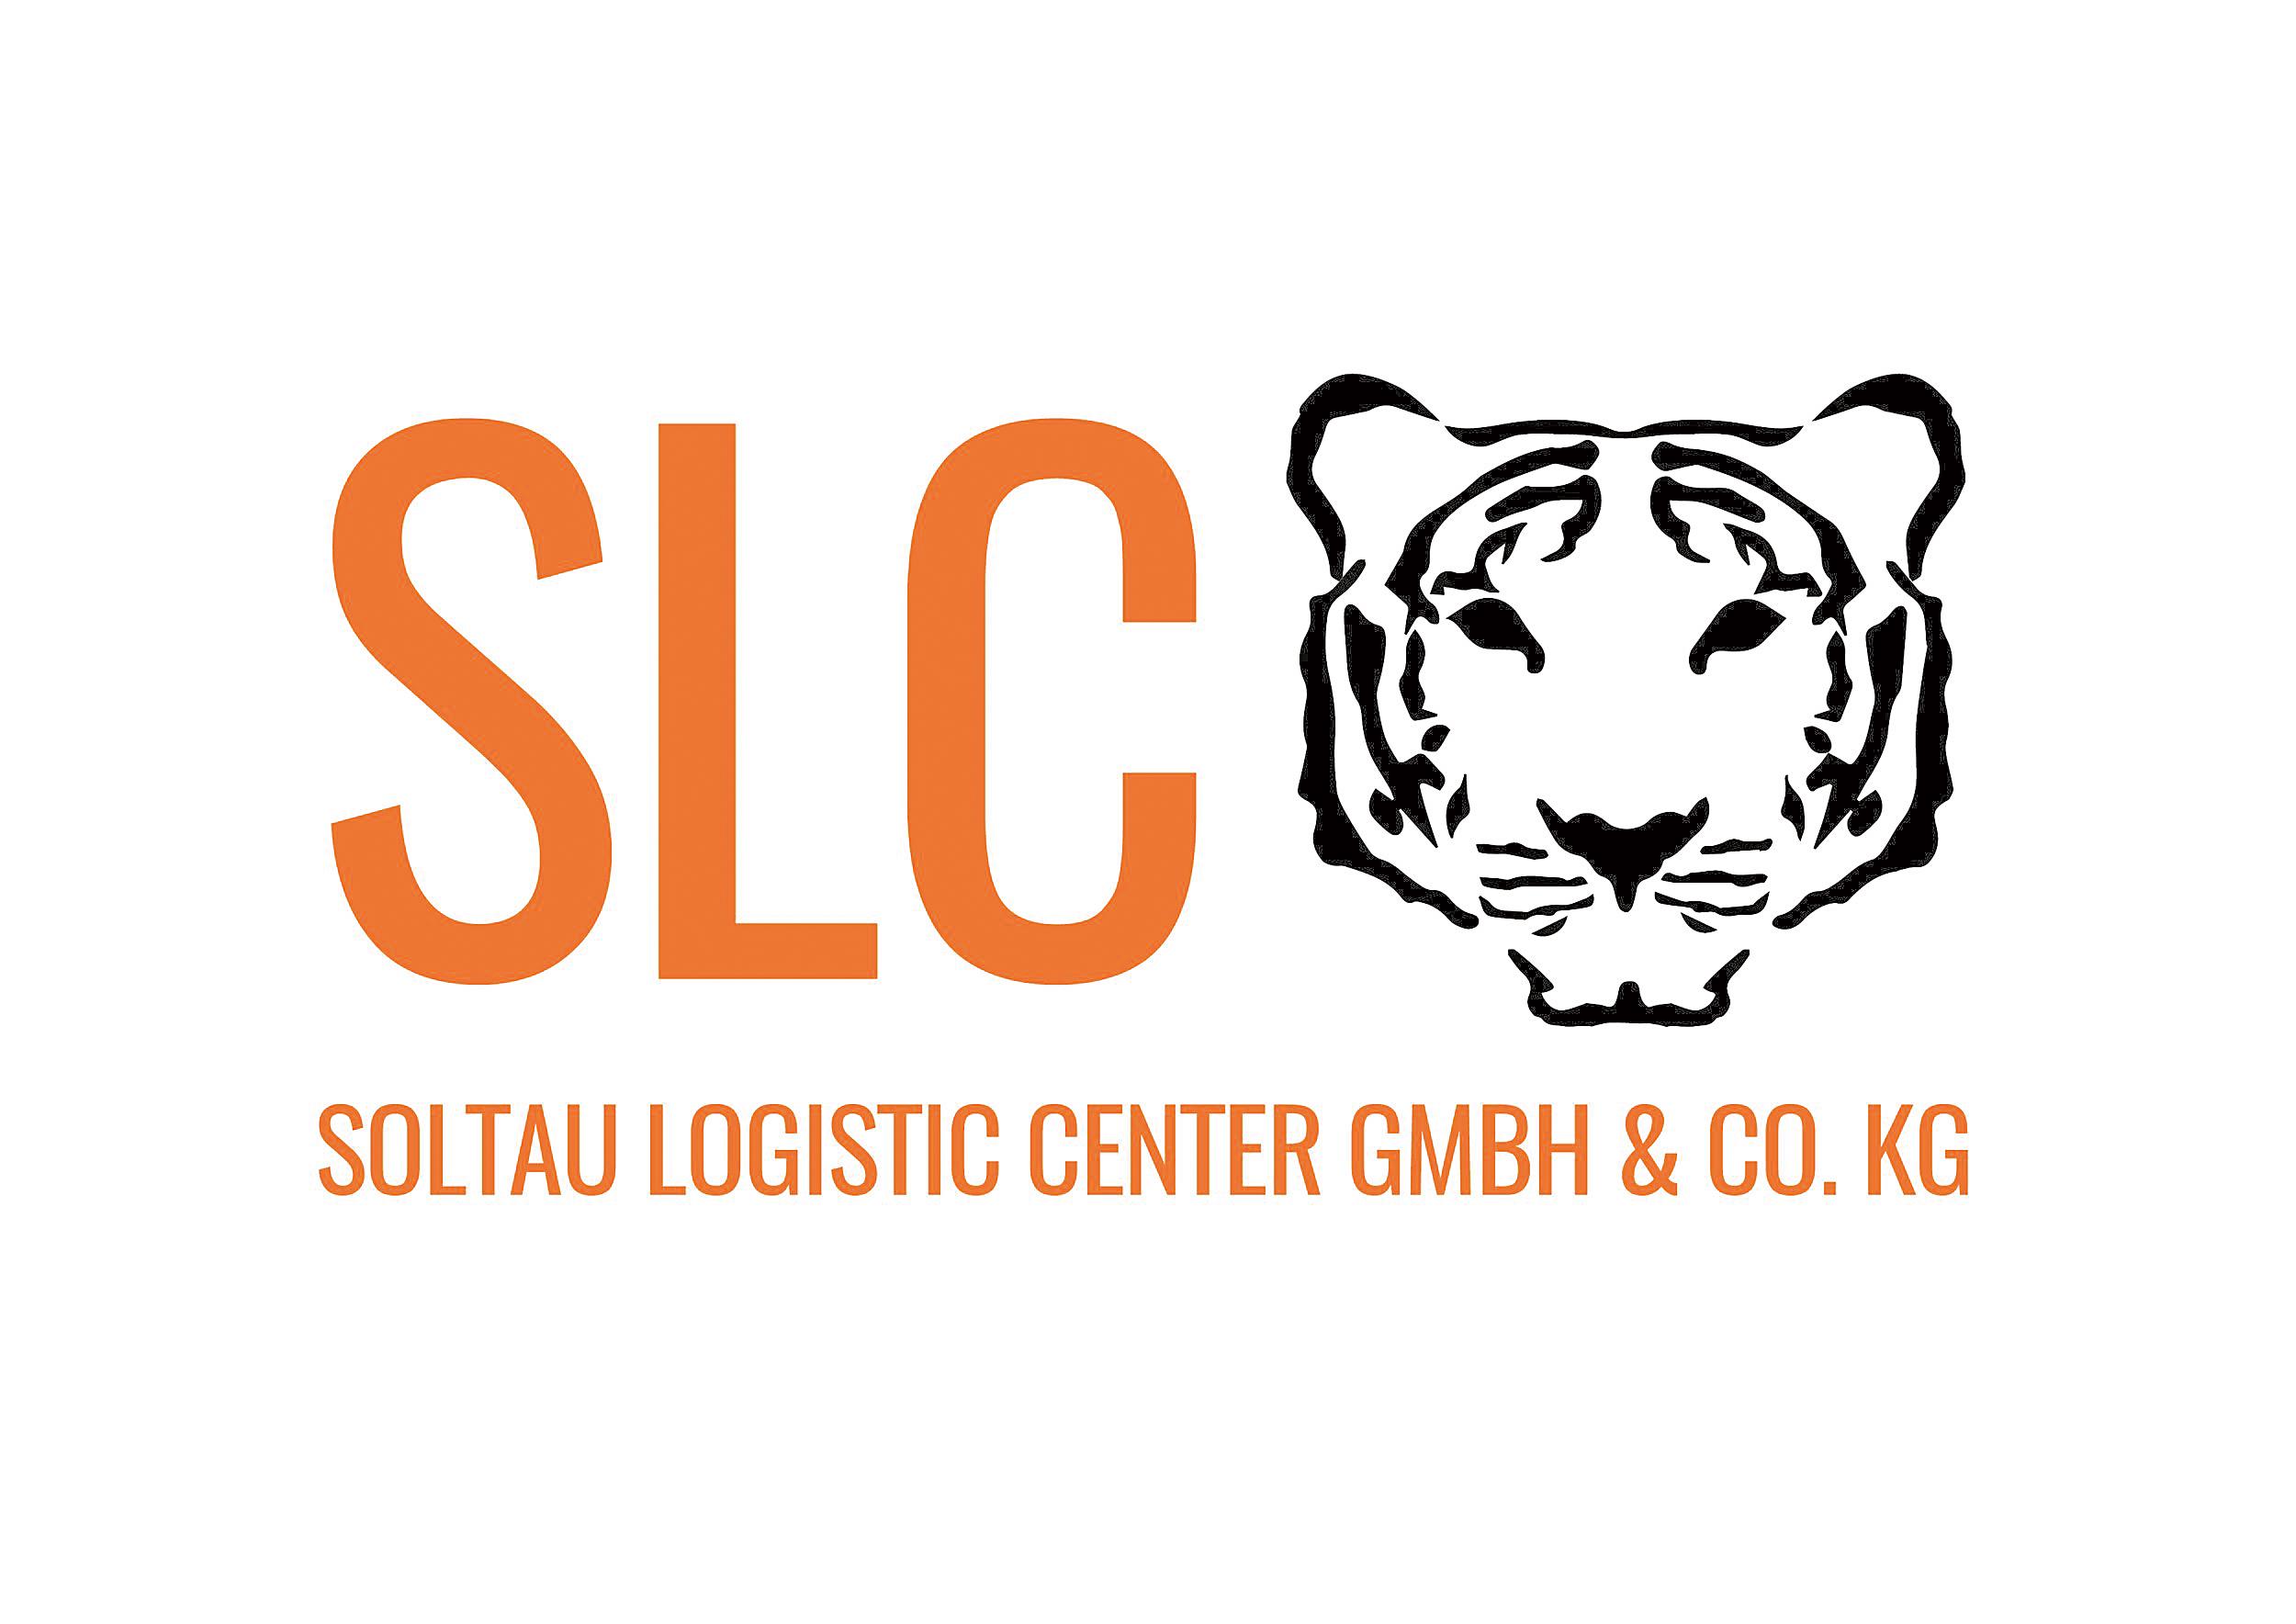 bzb_web_soltau_logistik_centrum_logo_2500x1768.jpg